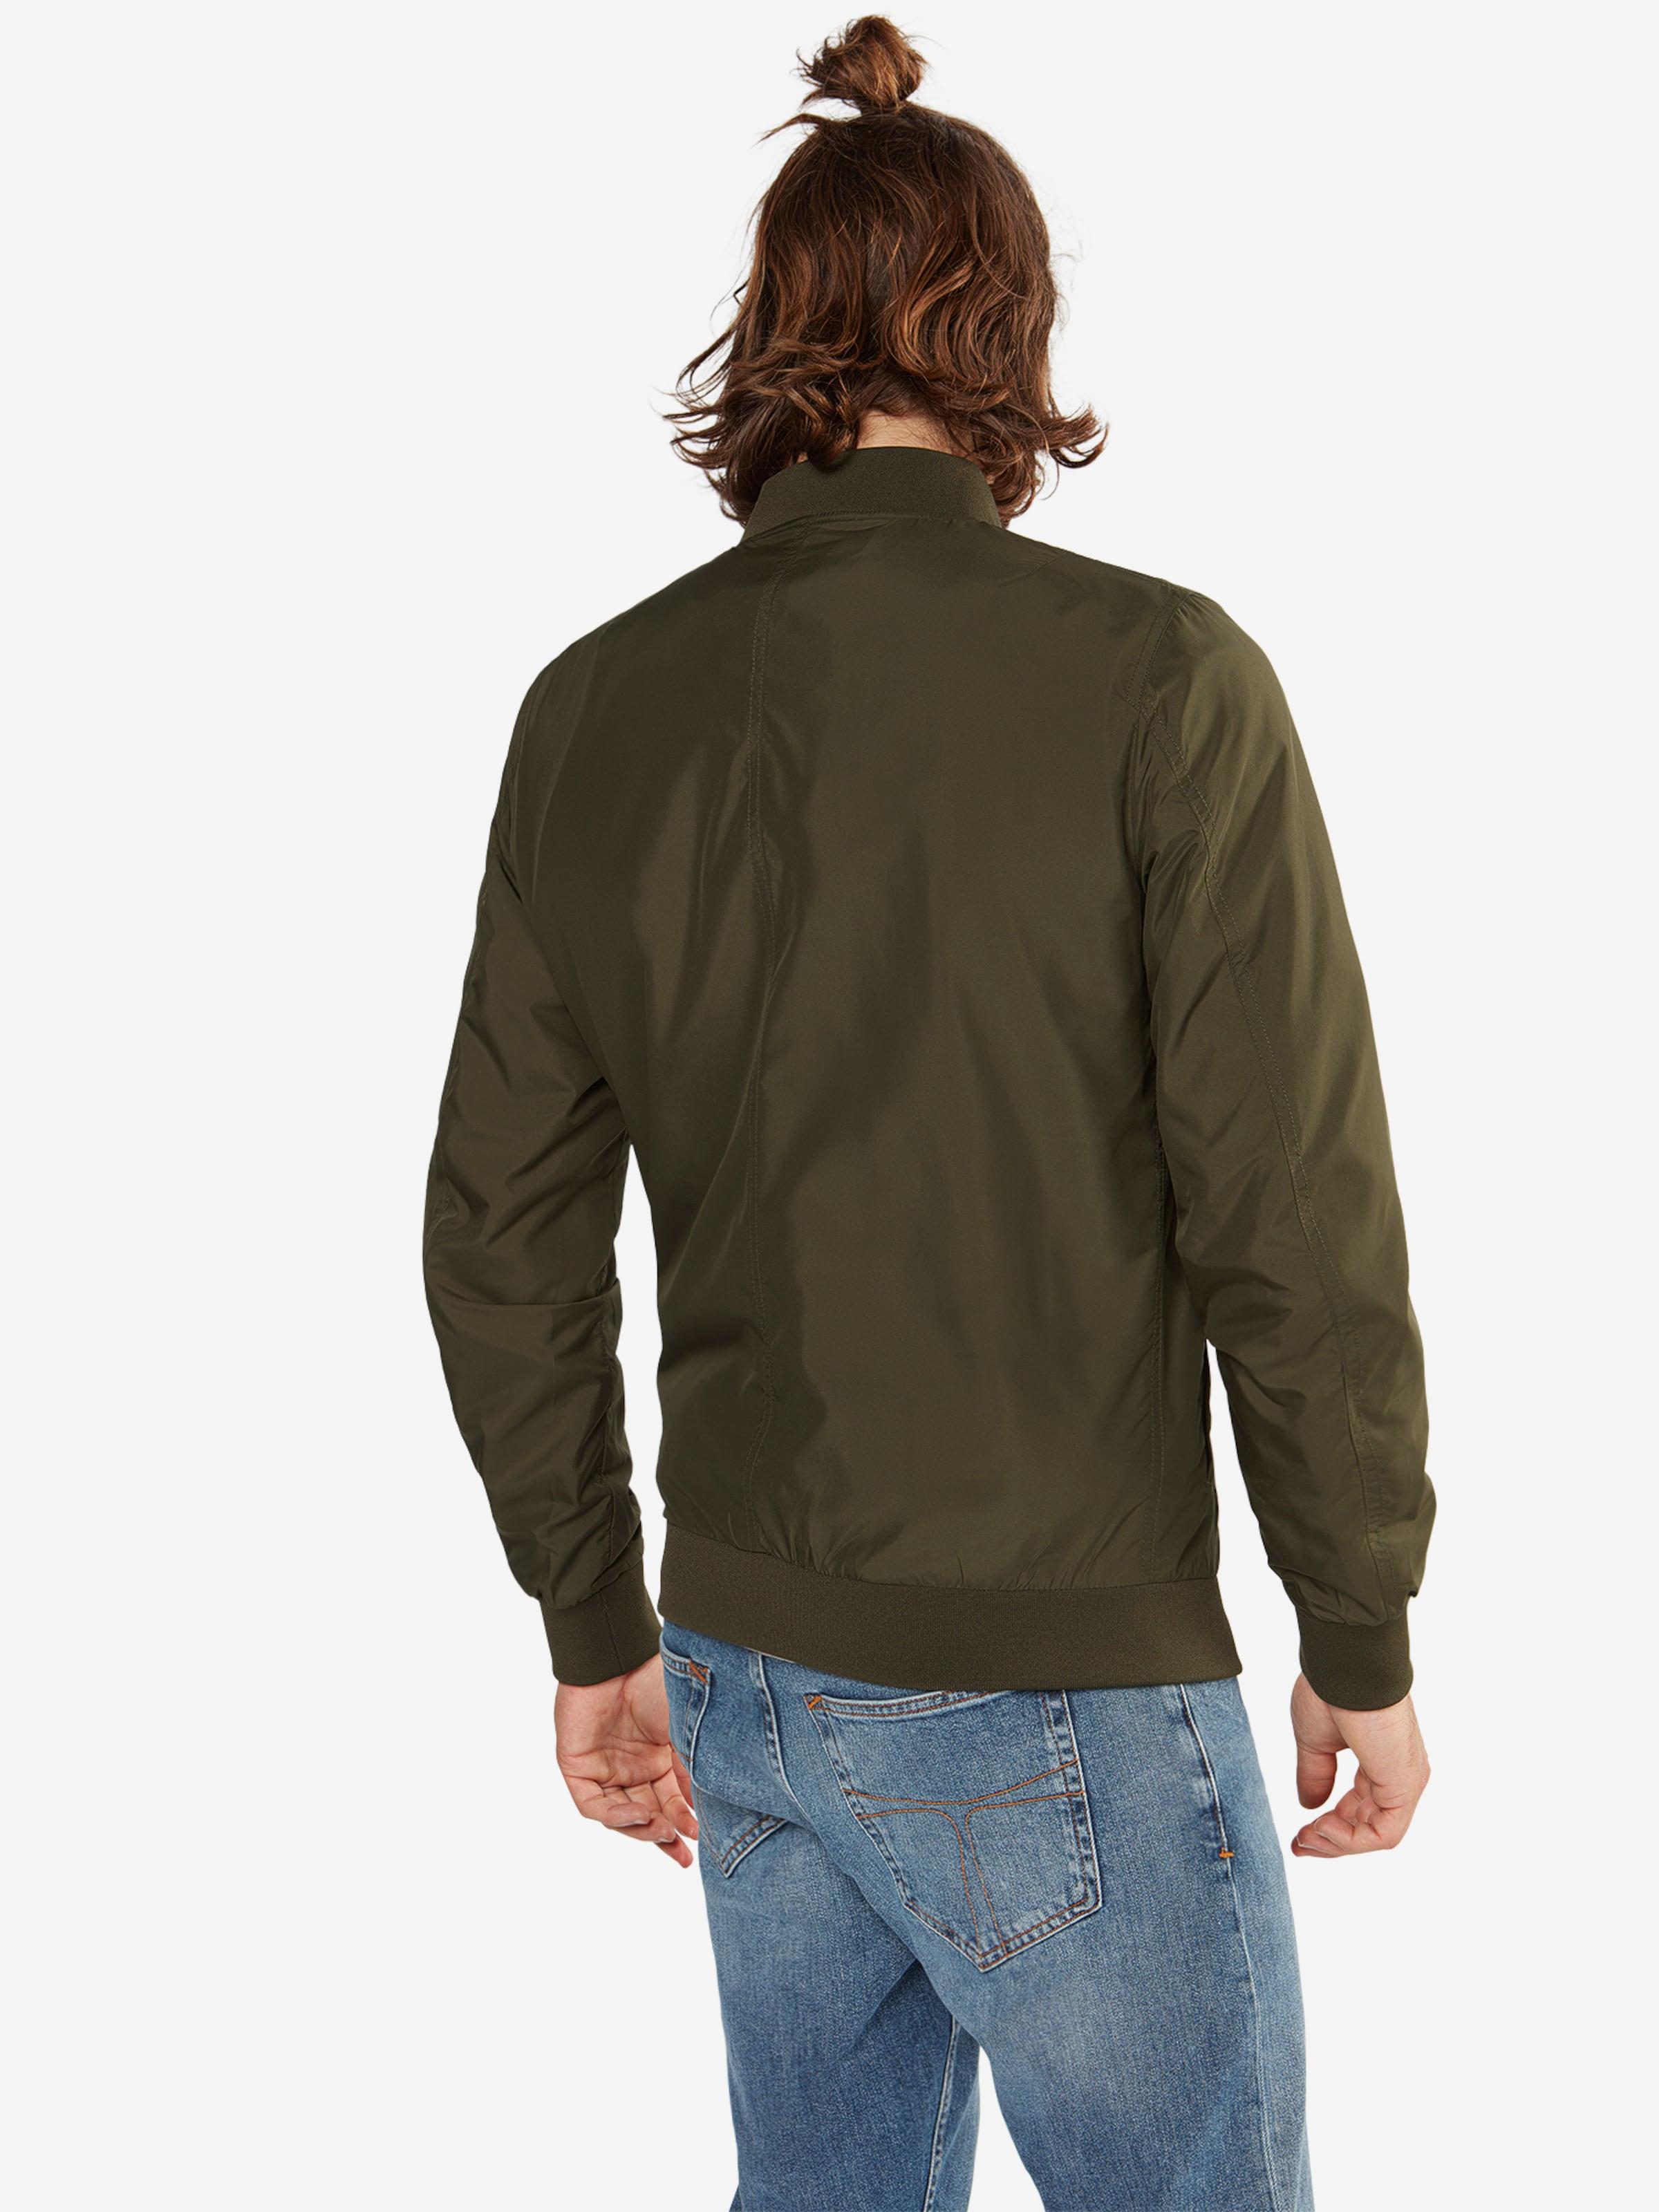 Jacket' Oliv Classics 'light In Urban Bomber byIYgf76v